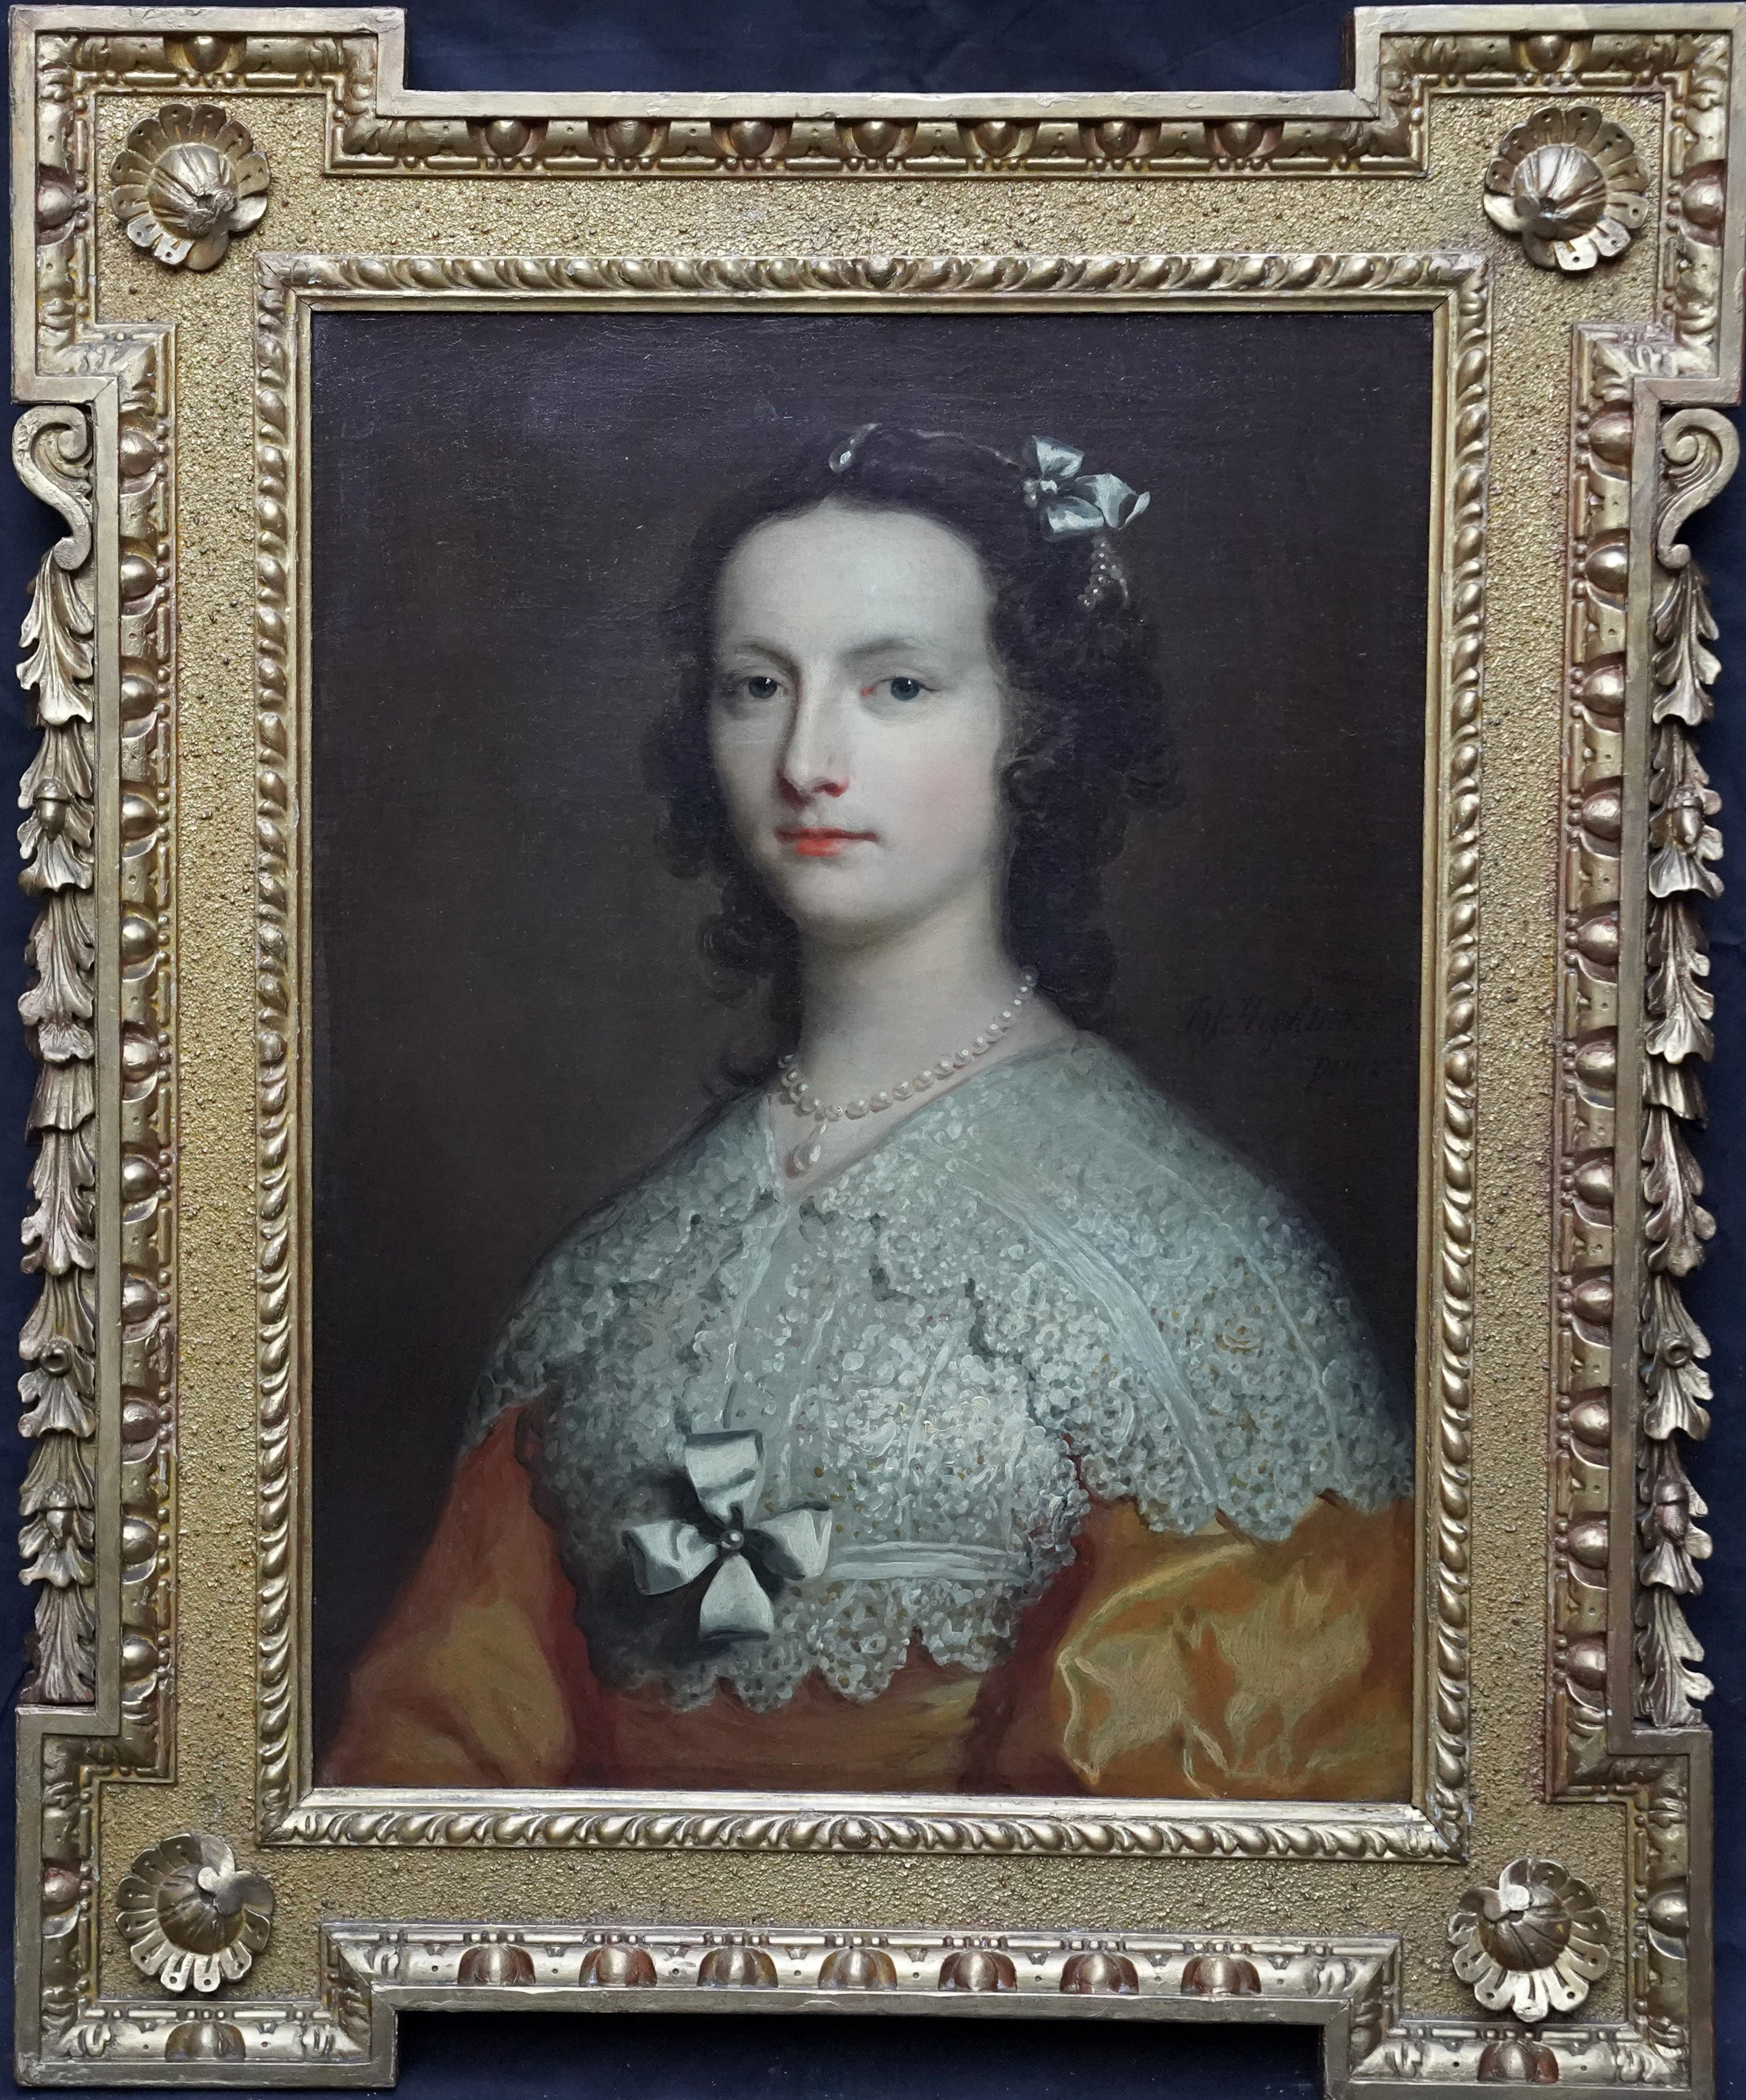 Portrait of Elizabeth Banks - British 18th Century art Old Master oil painting